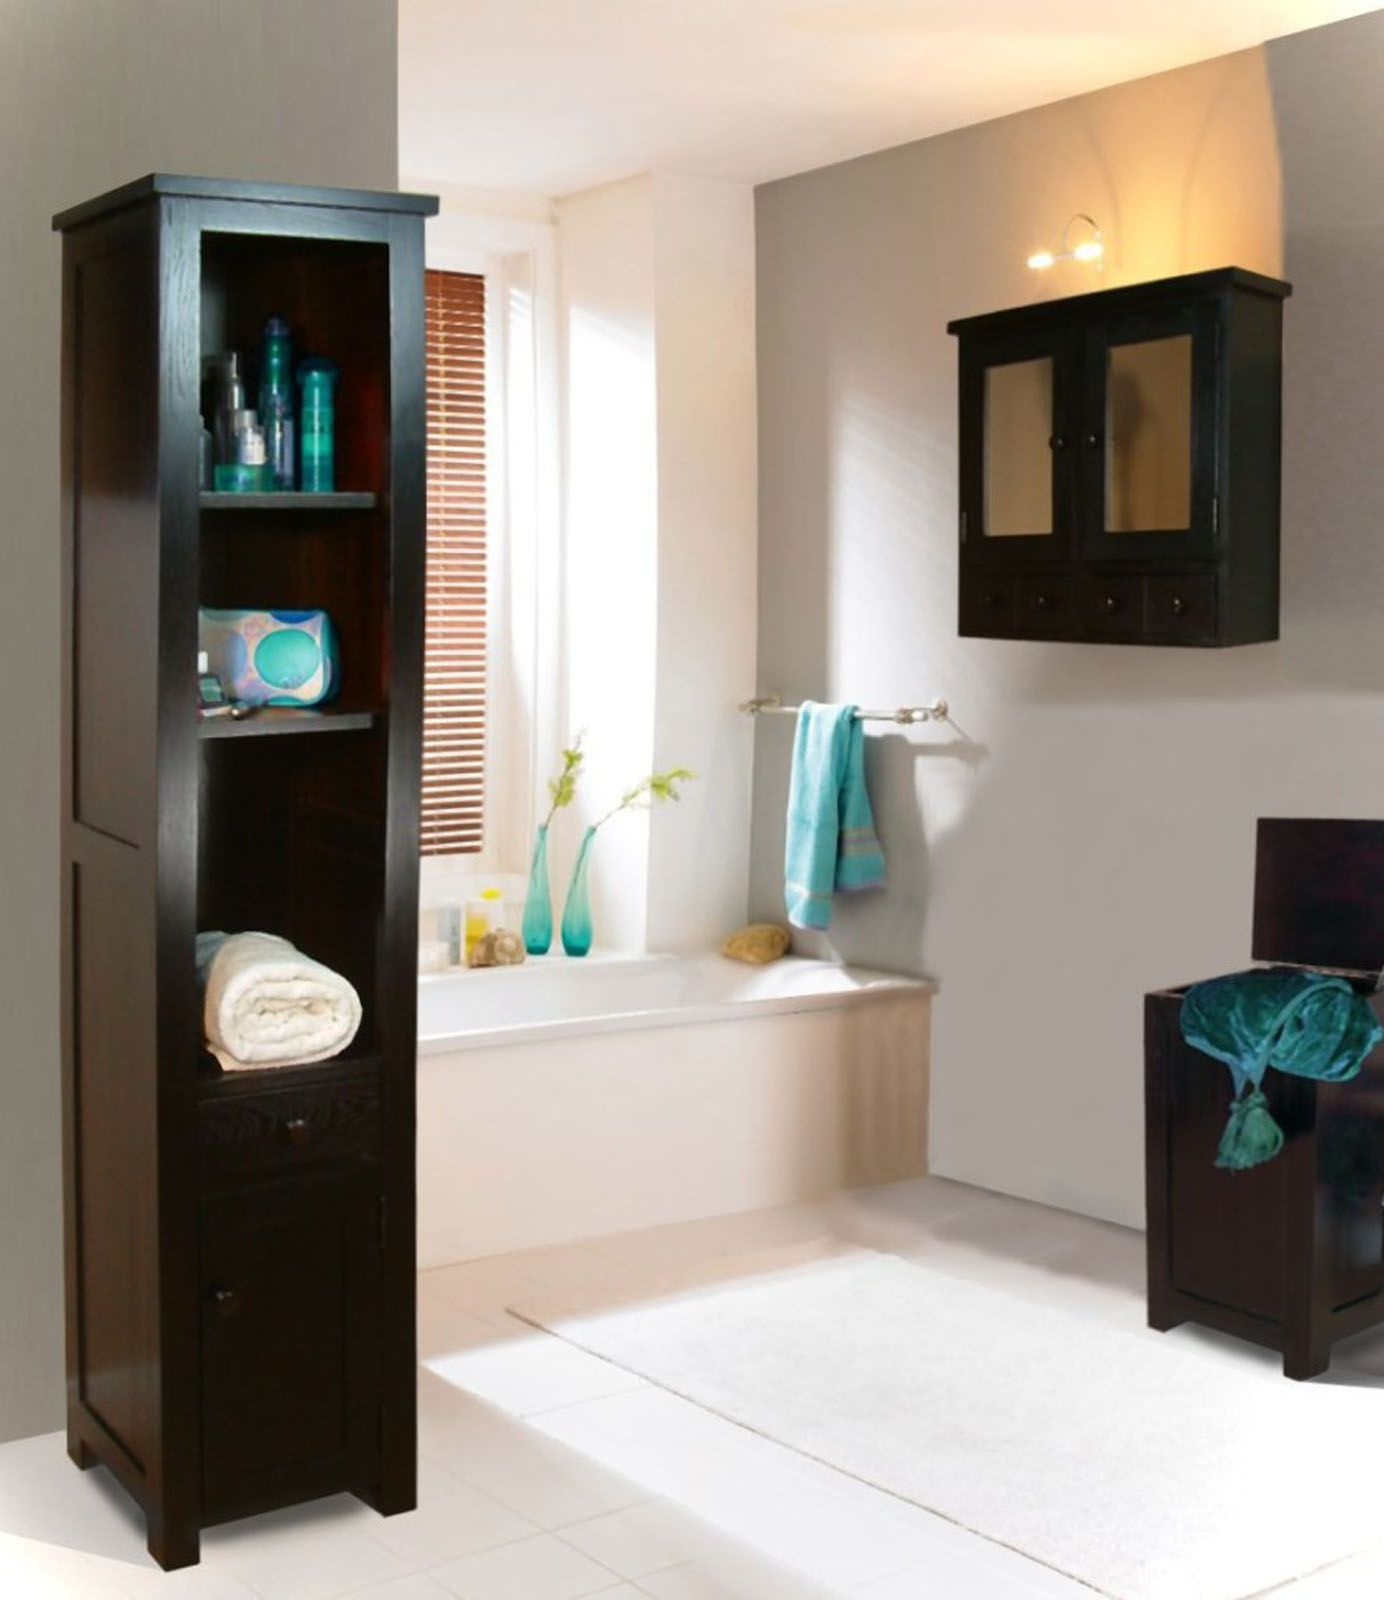 apartment bathroom decorating ideas on a budget. Bathroom Apartment Decorating Ideas Budget Backsplash Outdoor Medicine Cabinet Organization On A C